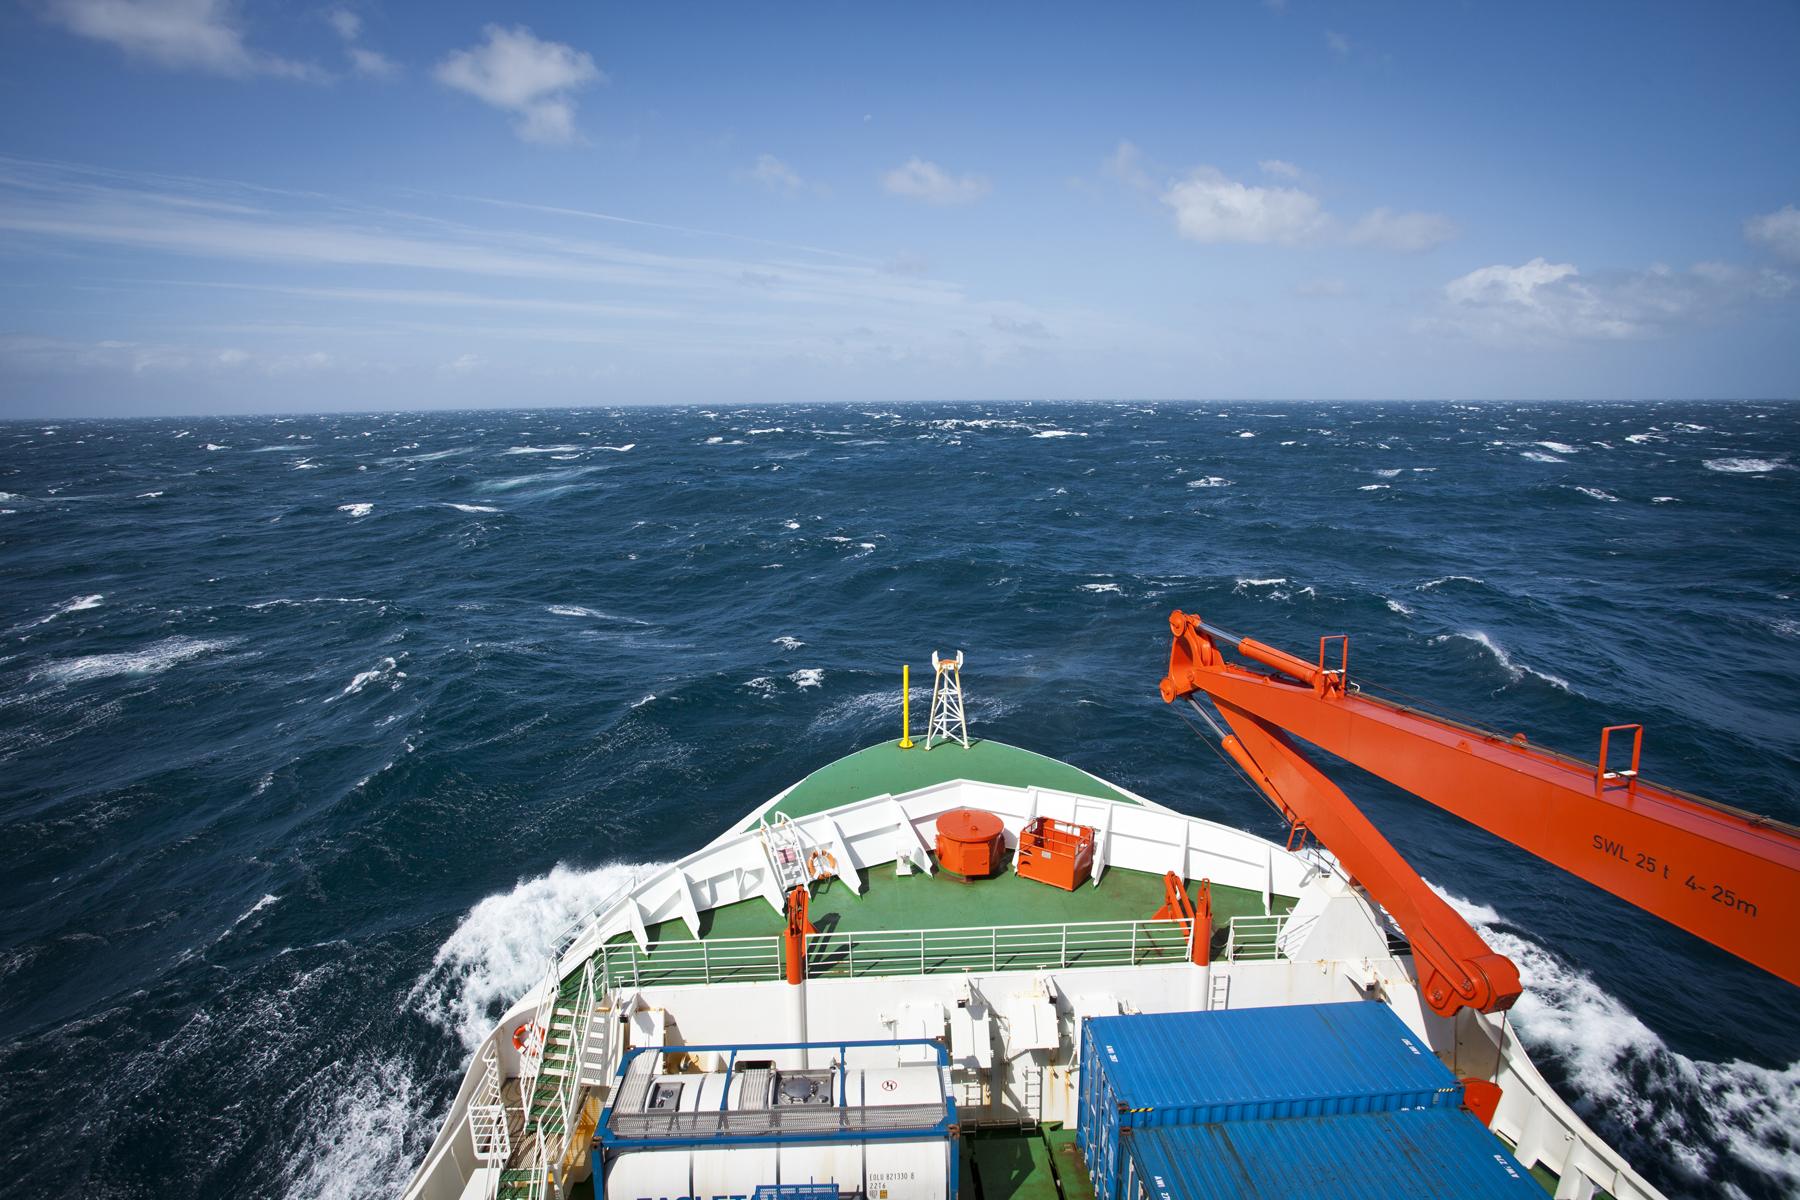 R/V Polarstern sailing across the Southern Ocean.